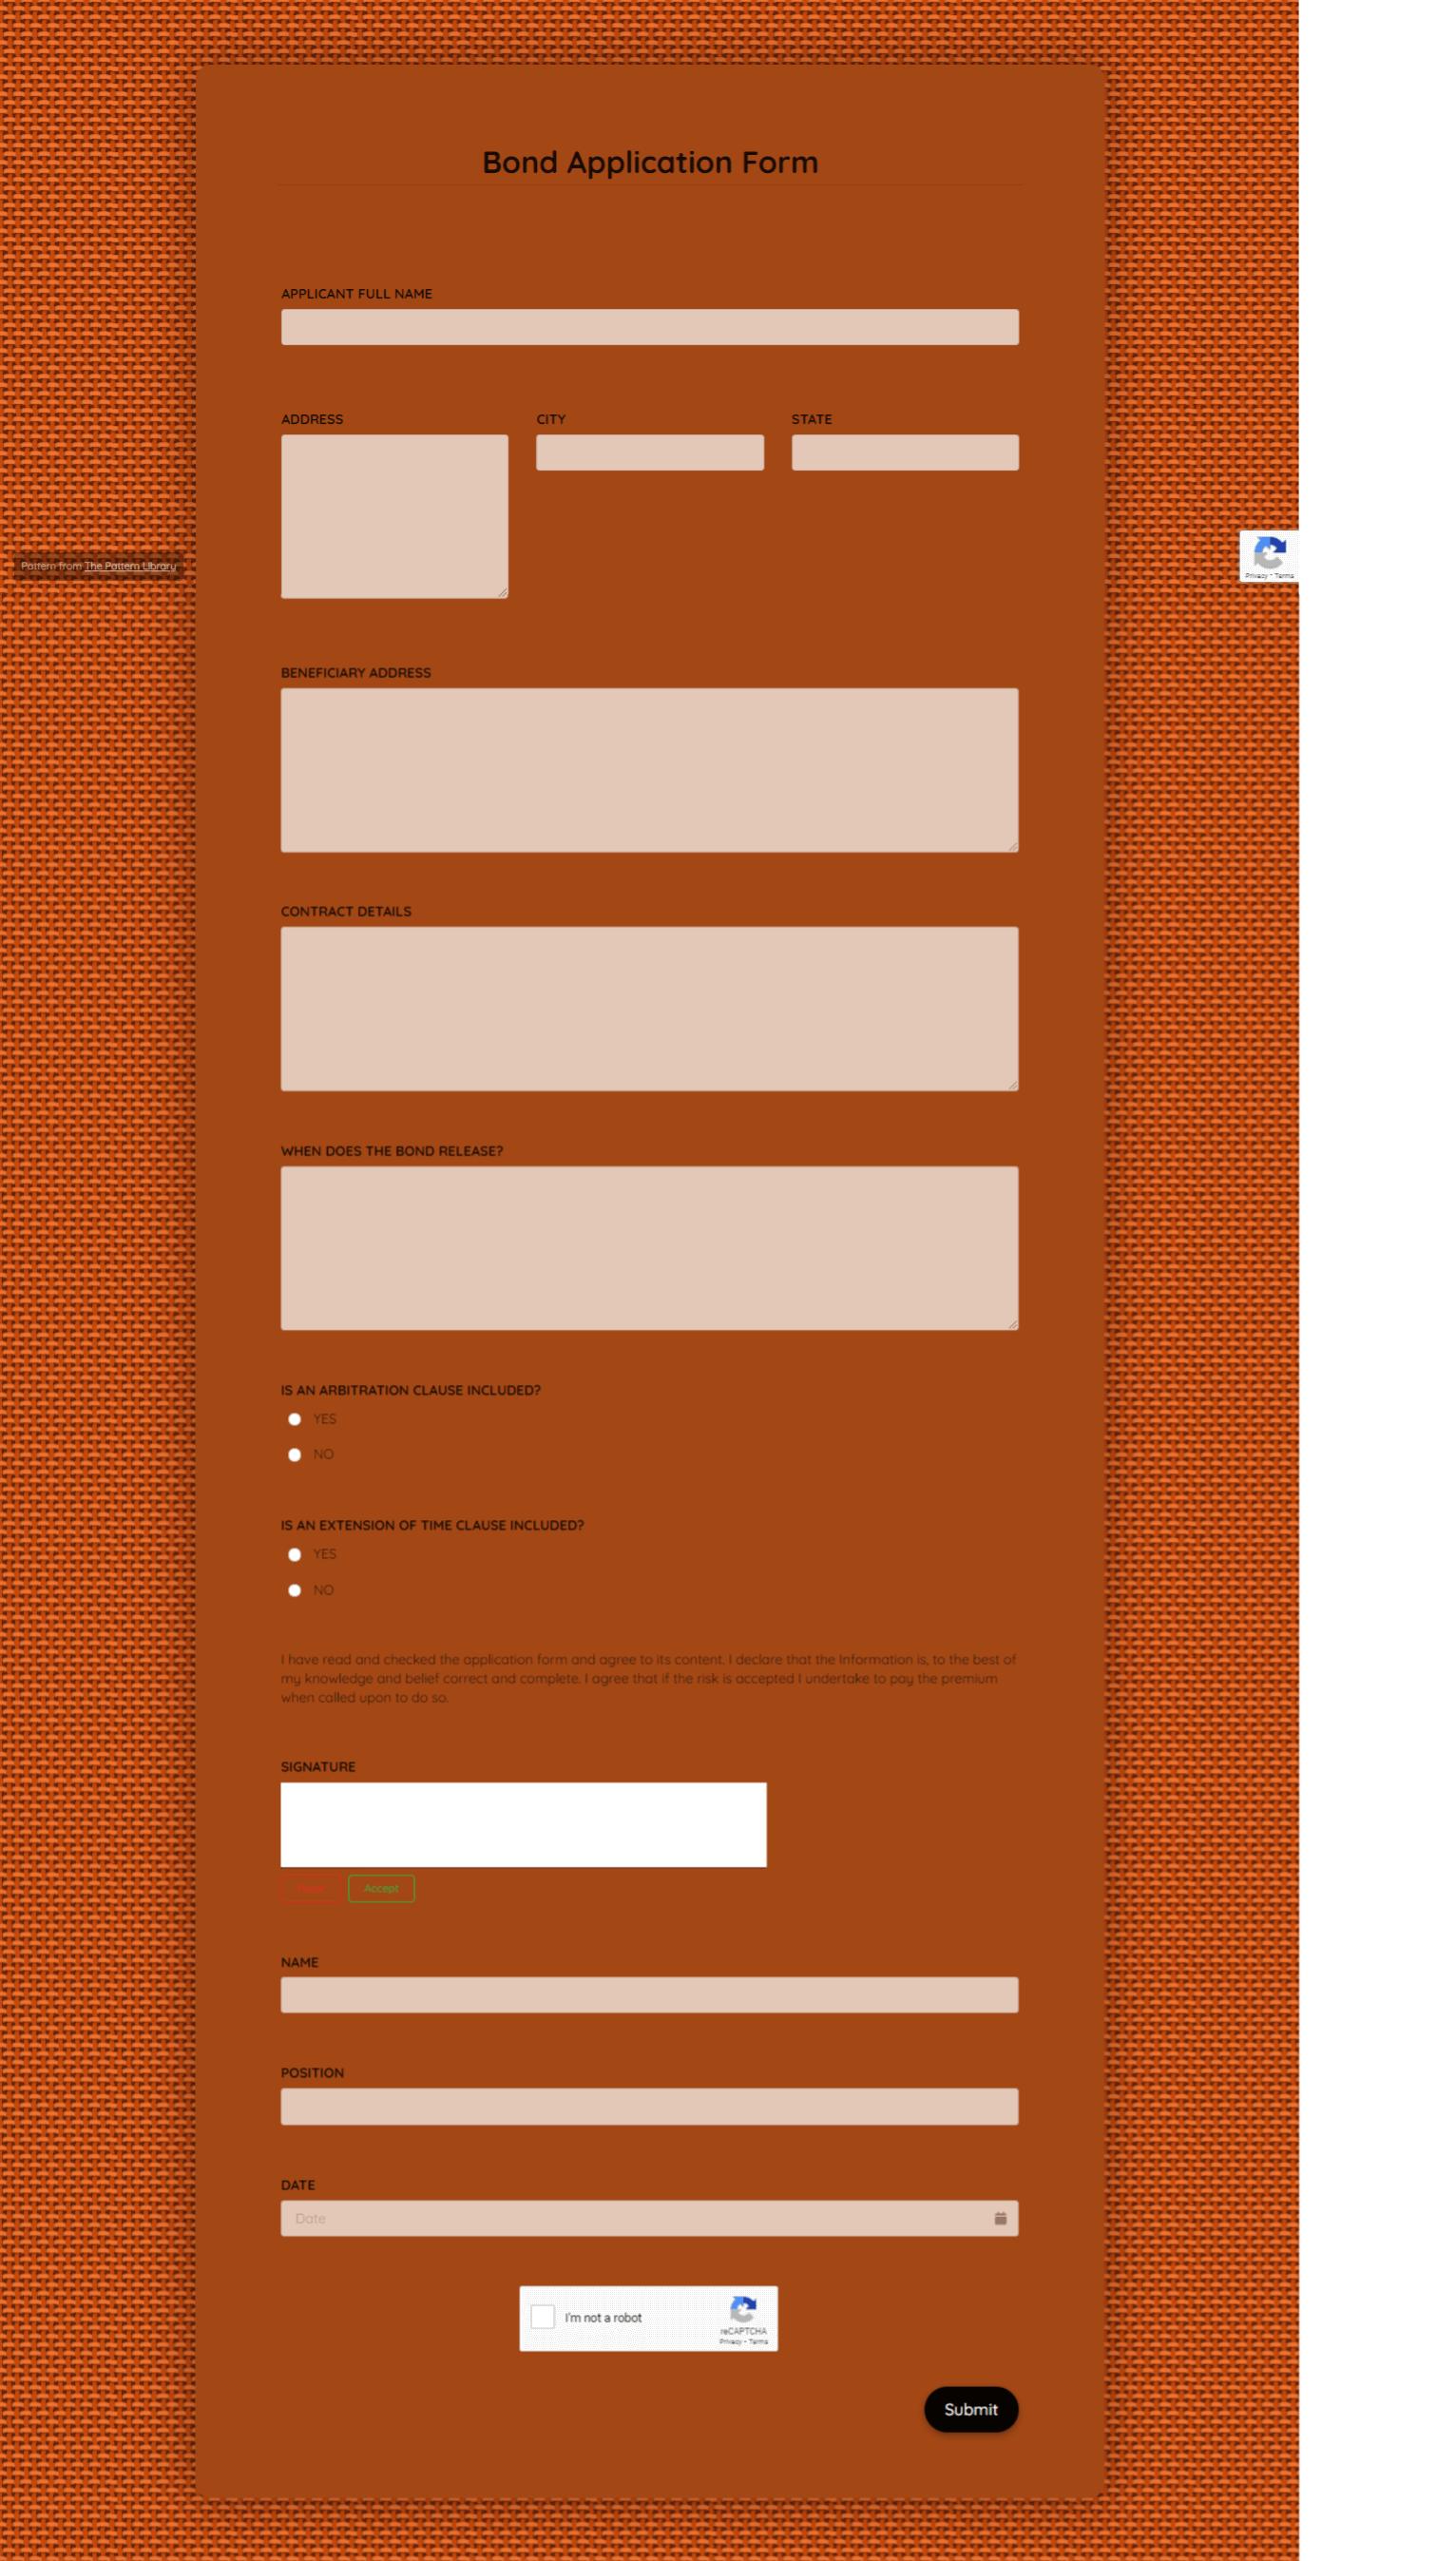 Bond Application Form Template template